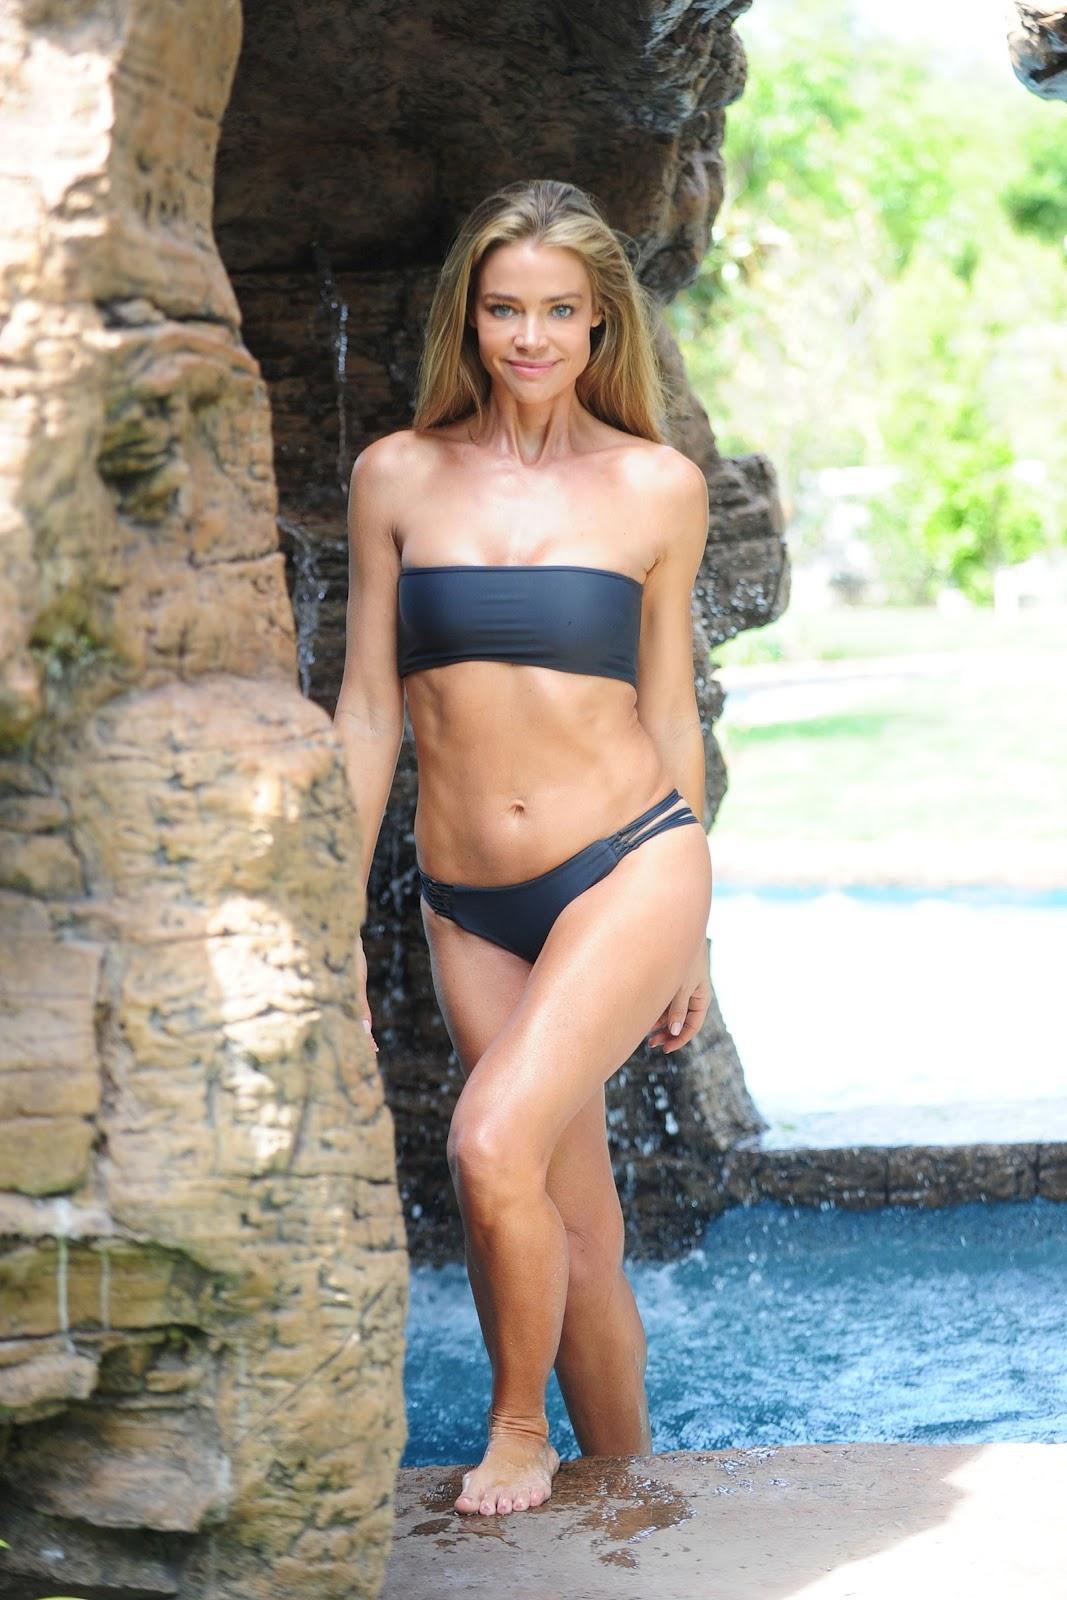 Lindsay Lohan Posing Nude in Playboy